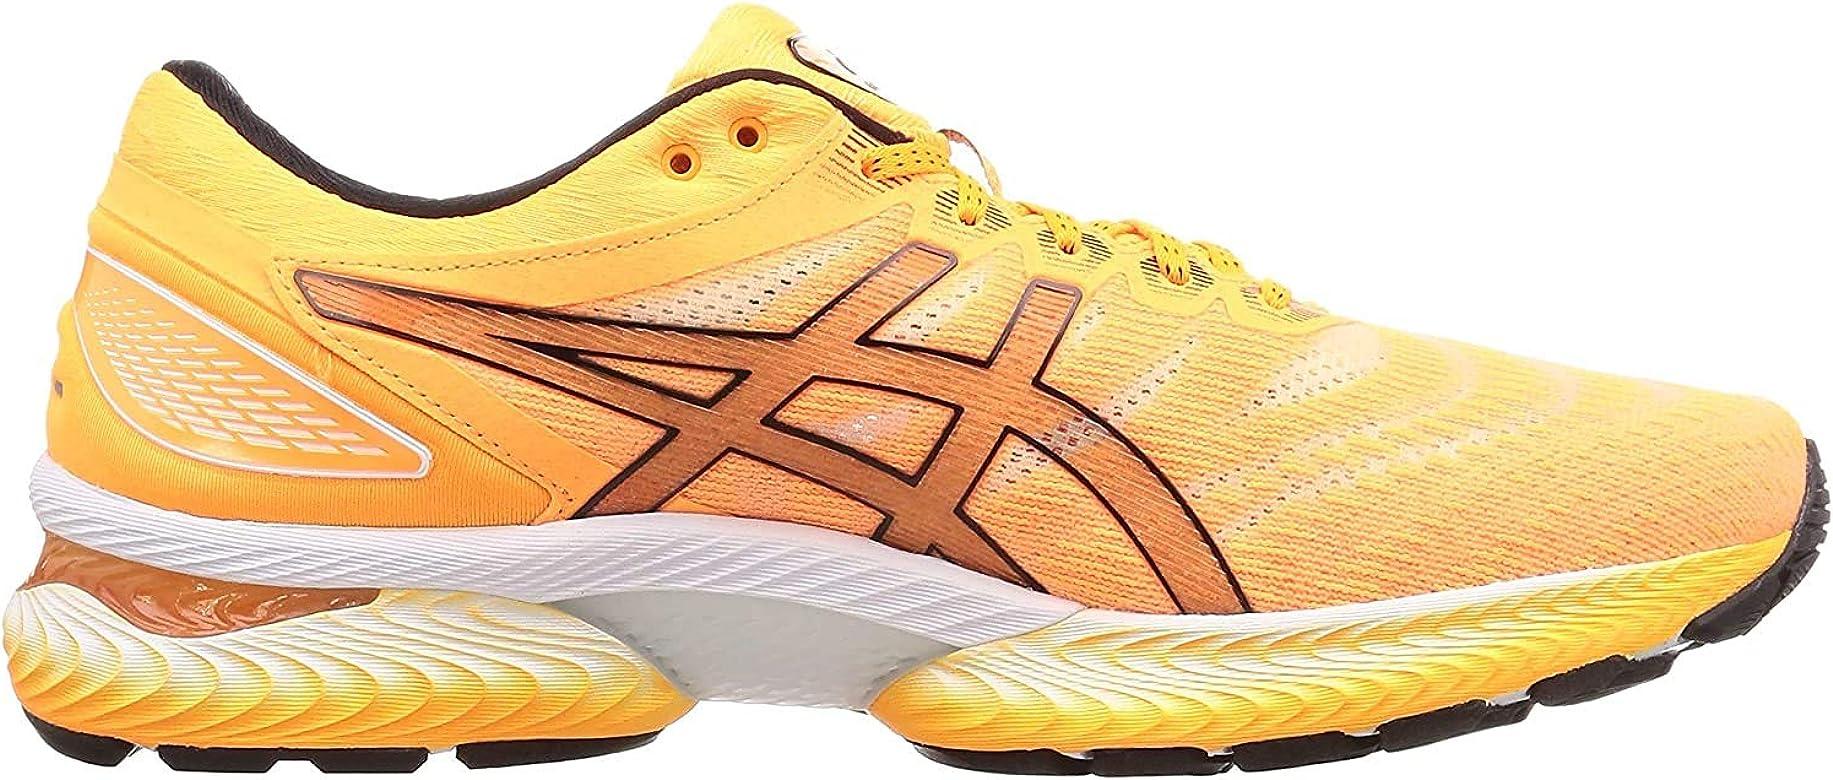 ASICS Chaussures Gel-Nimbus 22: Amazon.es: Deportes y aire libre